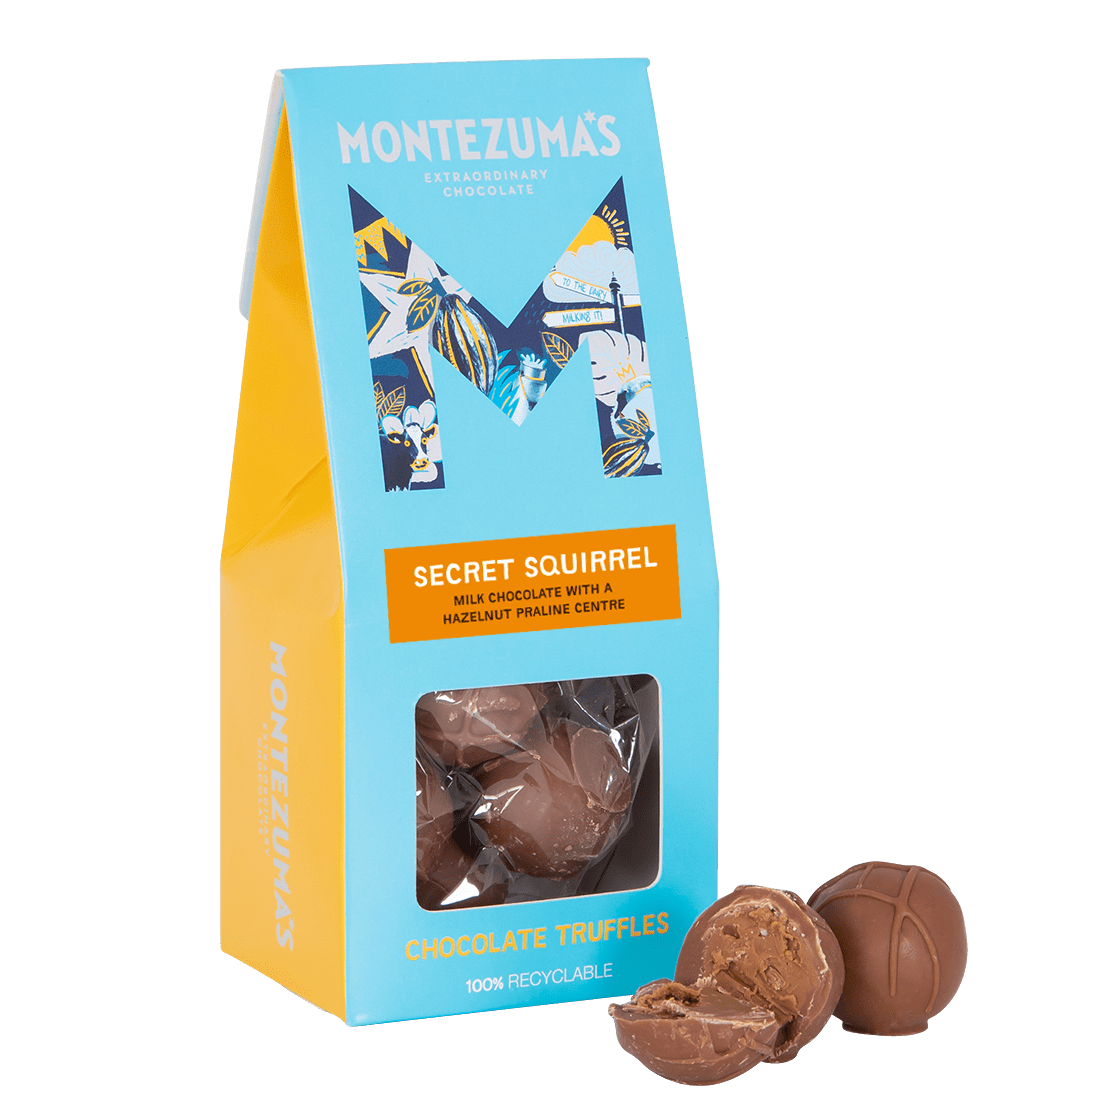 Secret Squirrel - Milk Chocolate Truffles with Hazelnut Praline